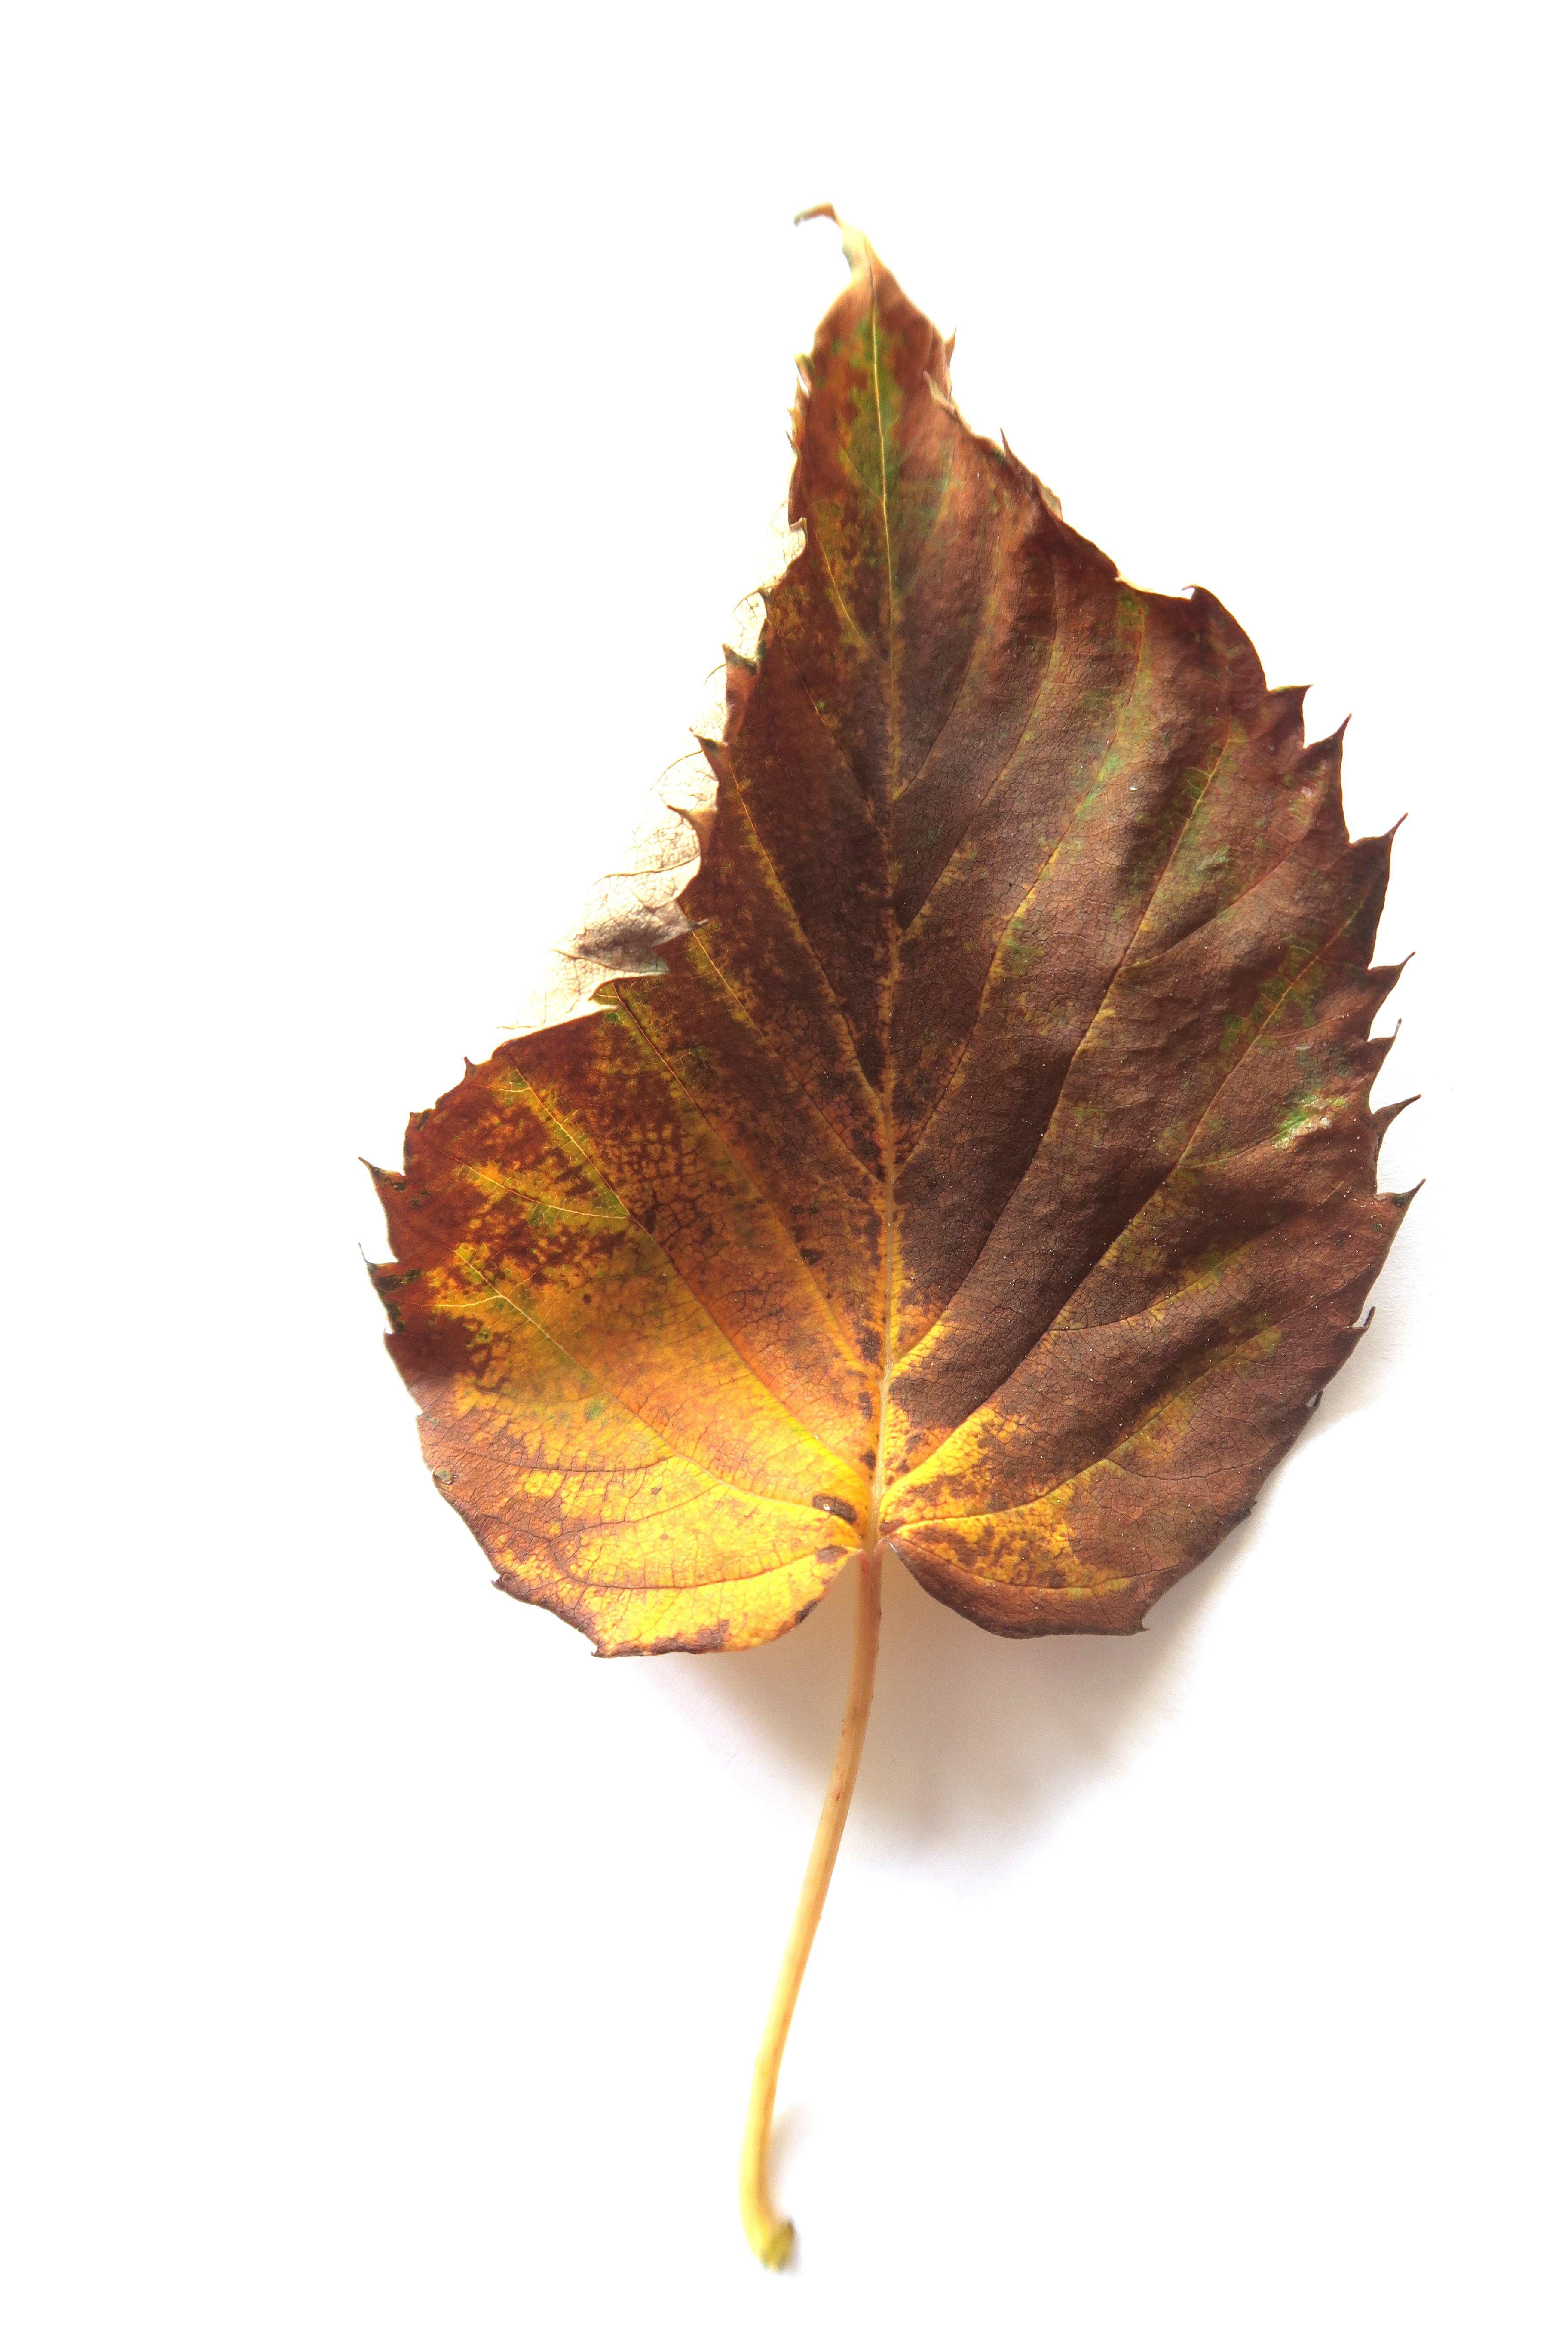 Autumn Leave from Denmark